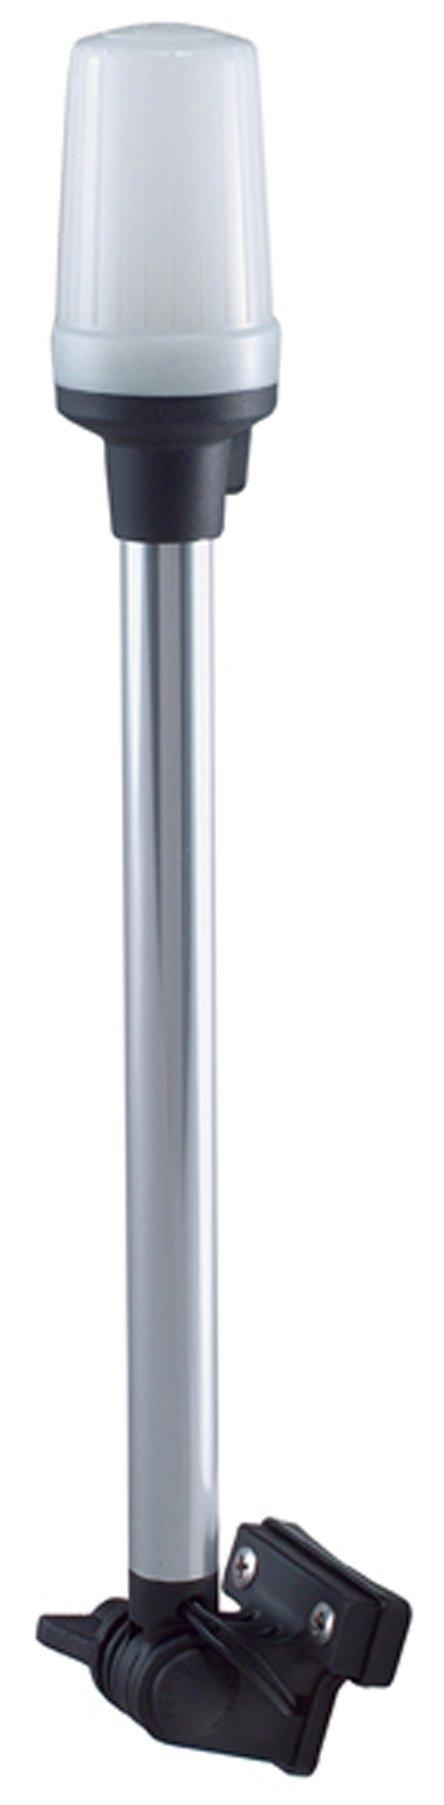 Perko 1134DP0CHR 14'' White Marine Stern Light with Bracket